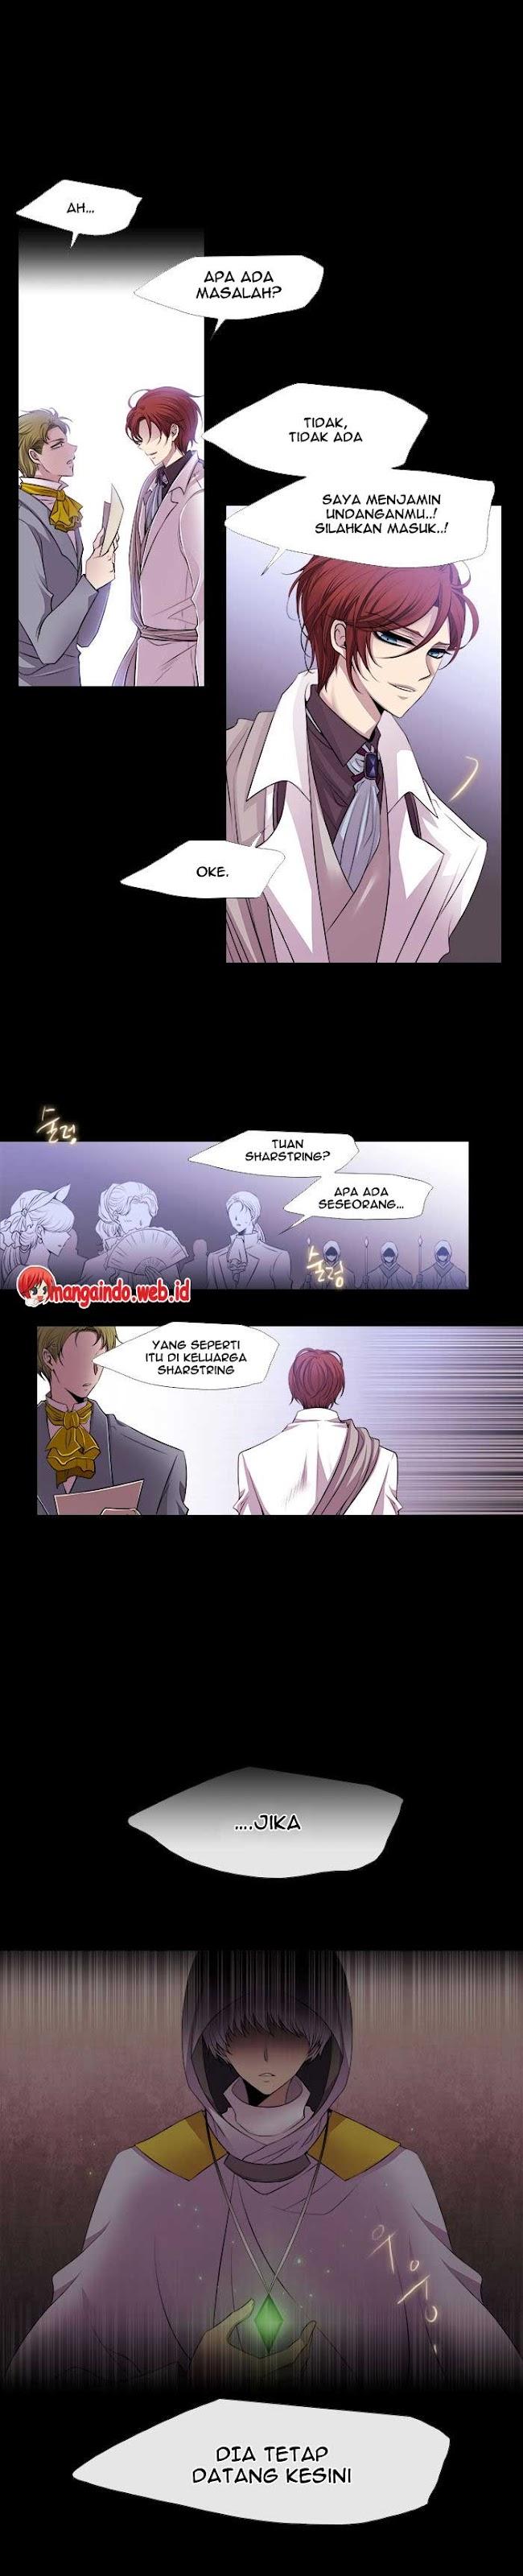 Komik black haze 213 - chapter 213 214 Indonesia black haze 213 - chapter 213 Terbaru 2|Baca Manga Komik Indonesia